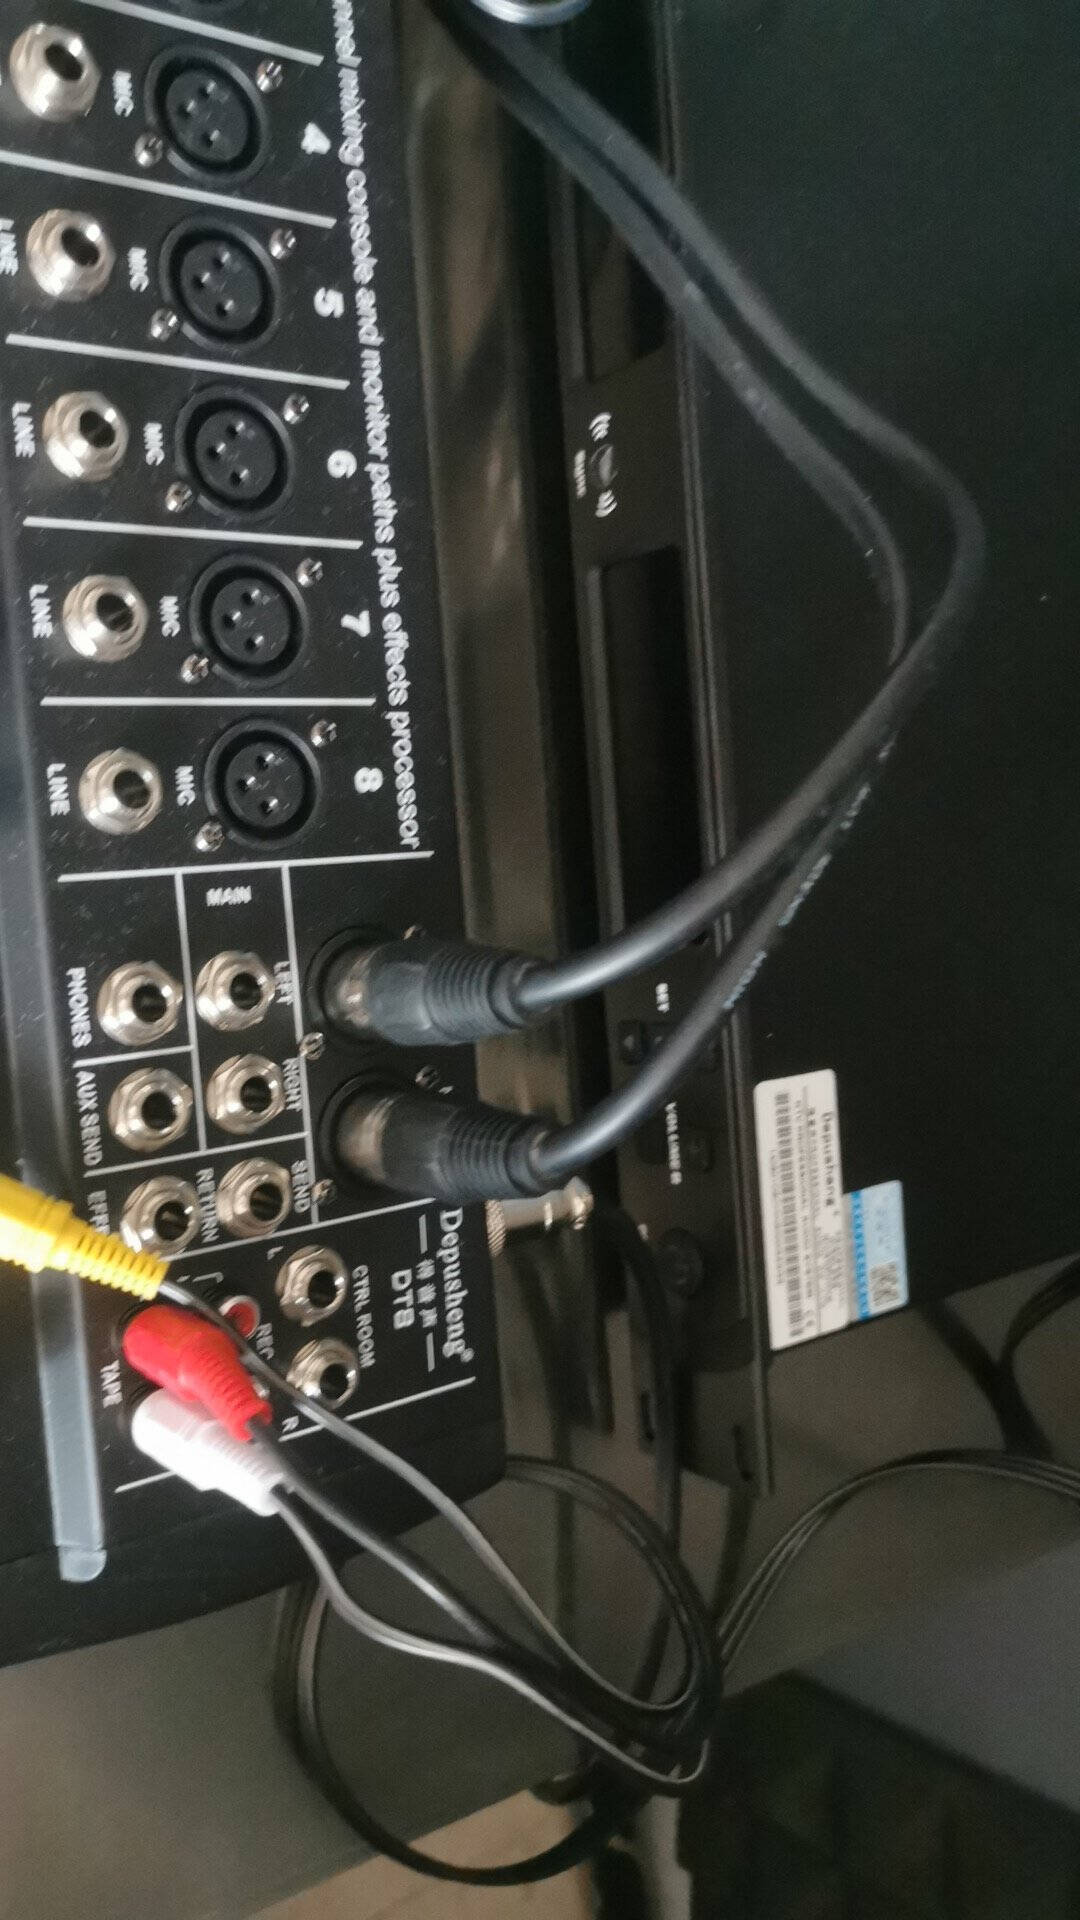 depusheng卡侬线公对母音频延长线莲花RCA麦克风话筒线调音台音响箱功放摄影机平衡卡农线卡农母转莲花1.3米2条